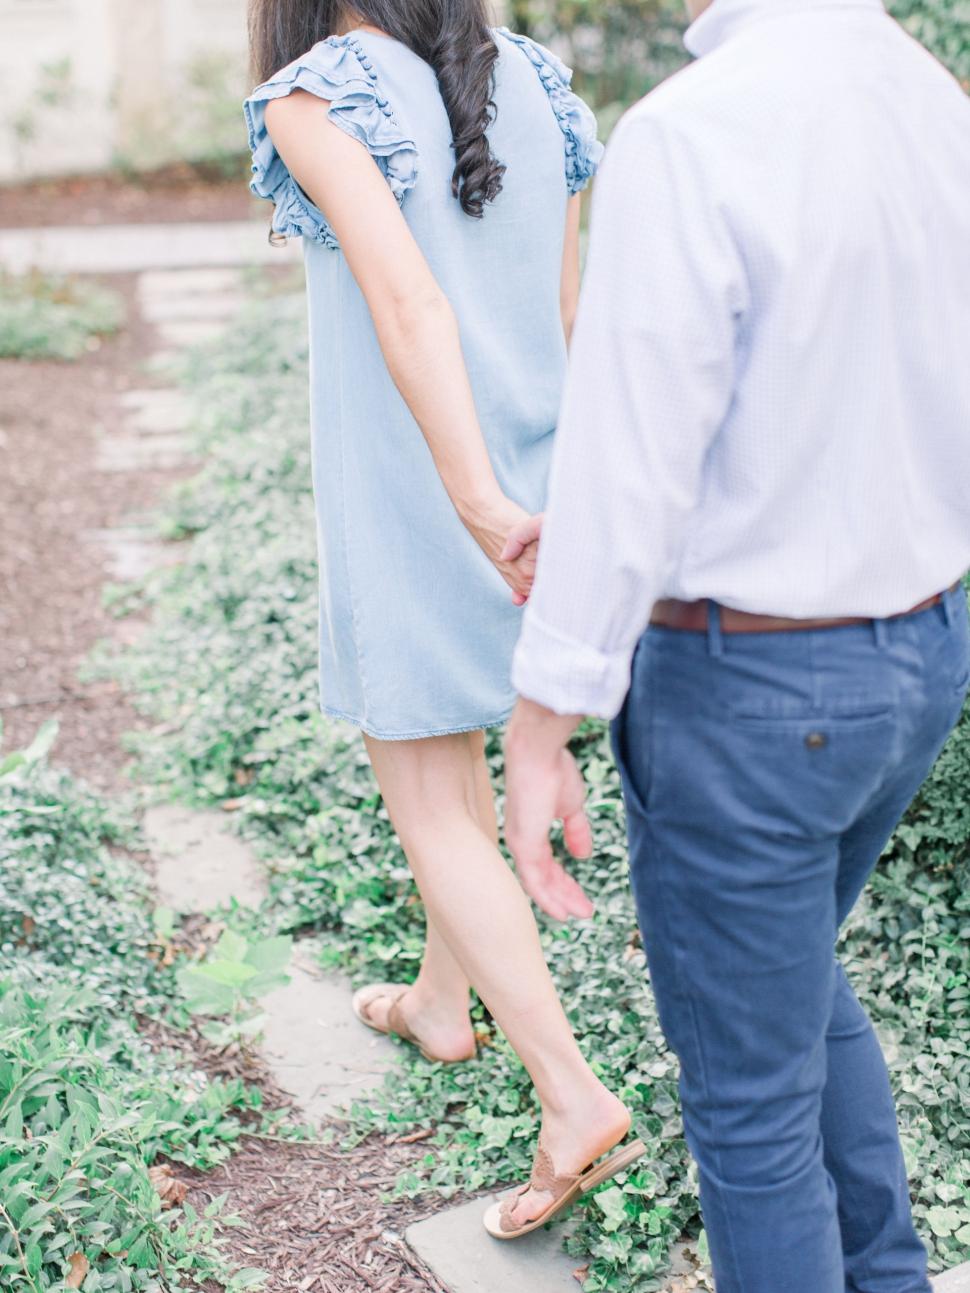 Philadelphia-Wedding-Photographer-Cassi-Claire-Saint-Josephs-University-Engagement_14.jpg